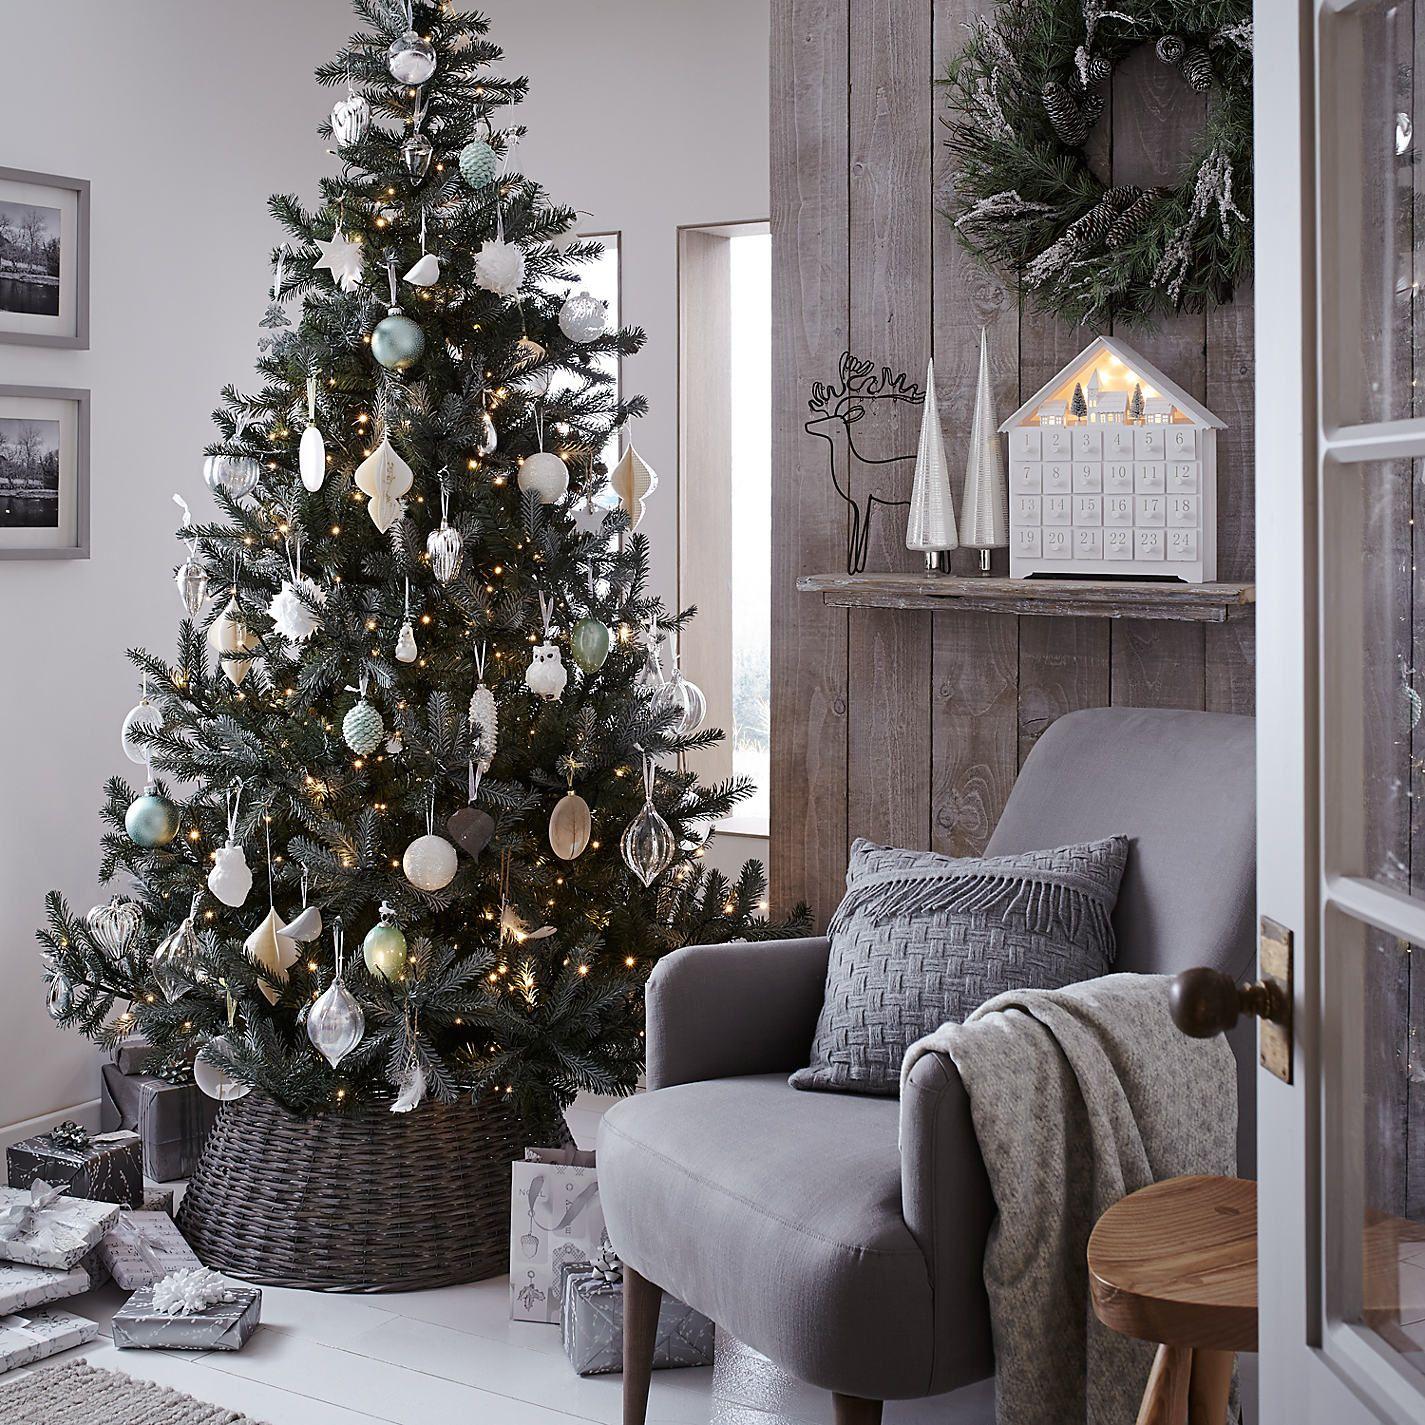 Buy Create The Look Croft John Lewis Christmas Interiors Scandinavian Christmas Trees Spruce Christmas Tree